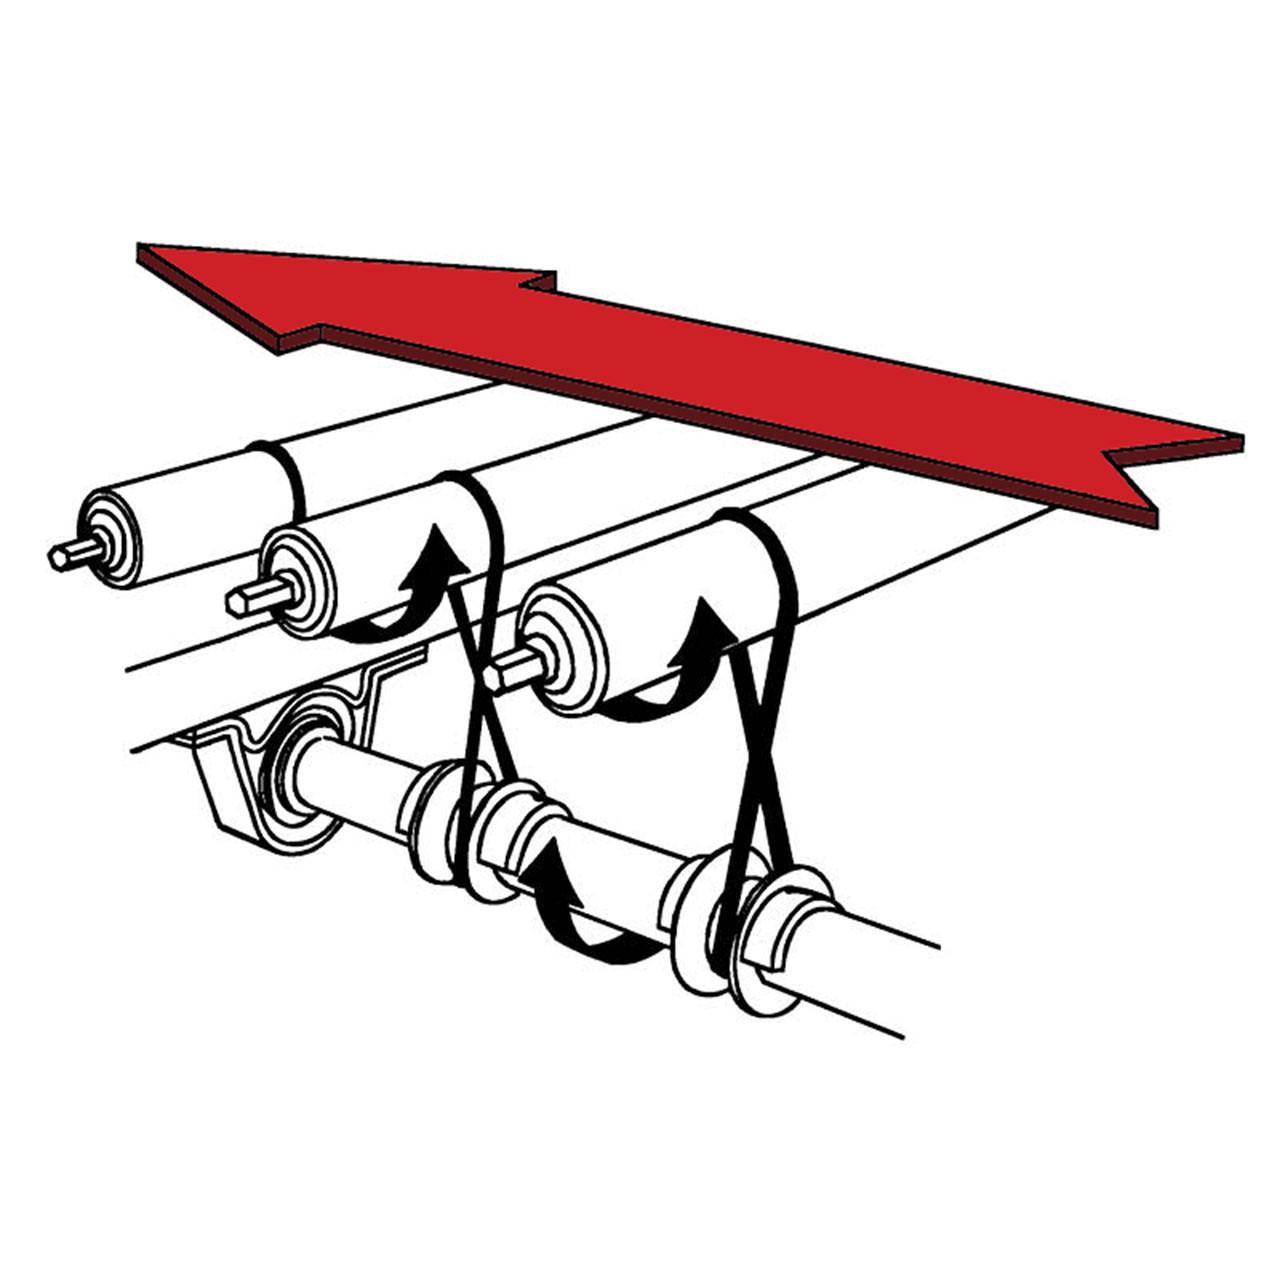 Lineshaft directional diagram